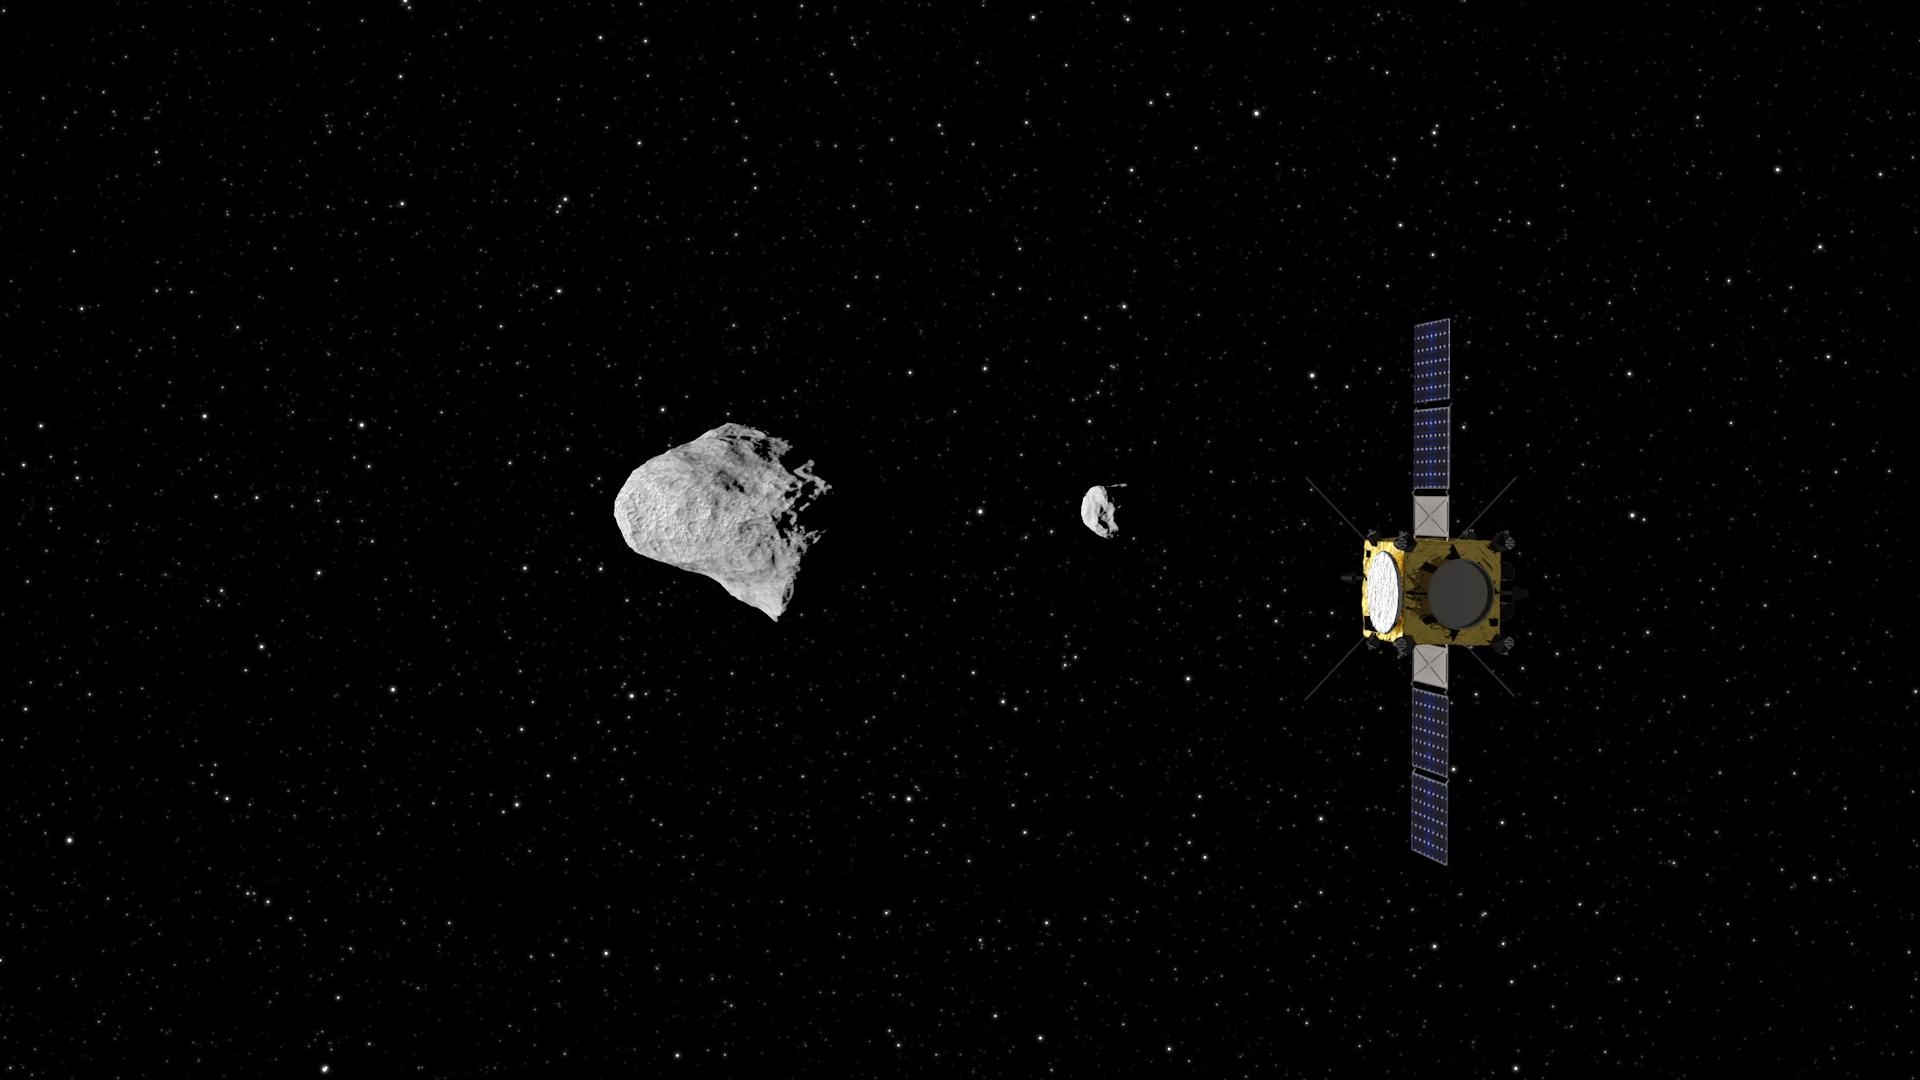 Avoiding 'Armageddon': Asteroid Deflection Test Planned ...